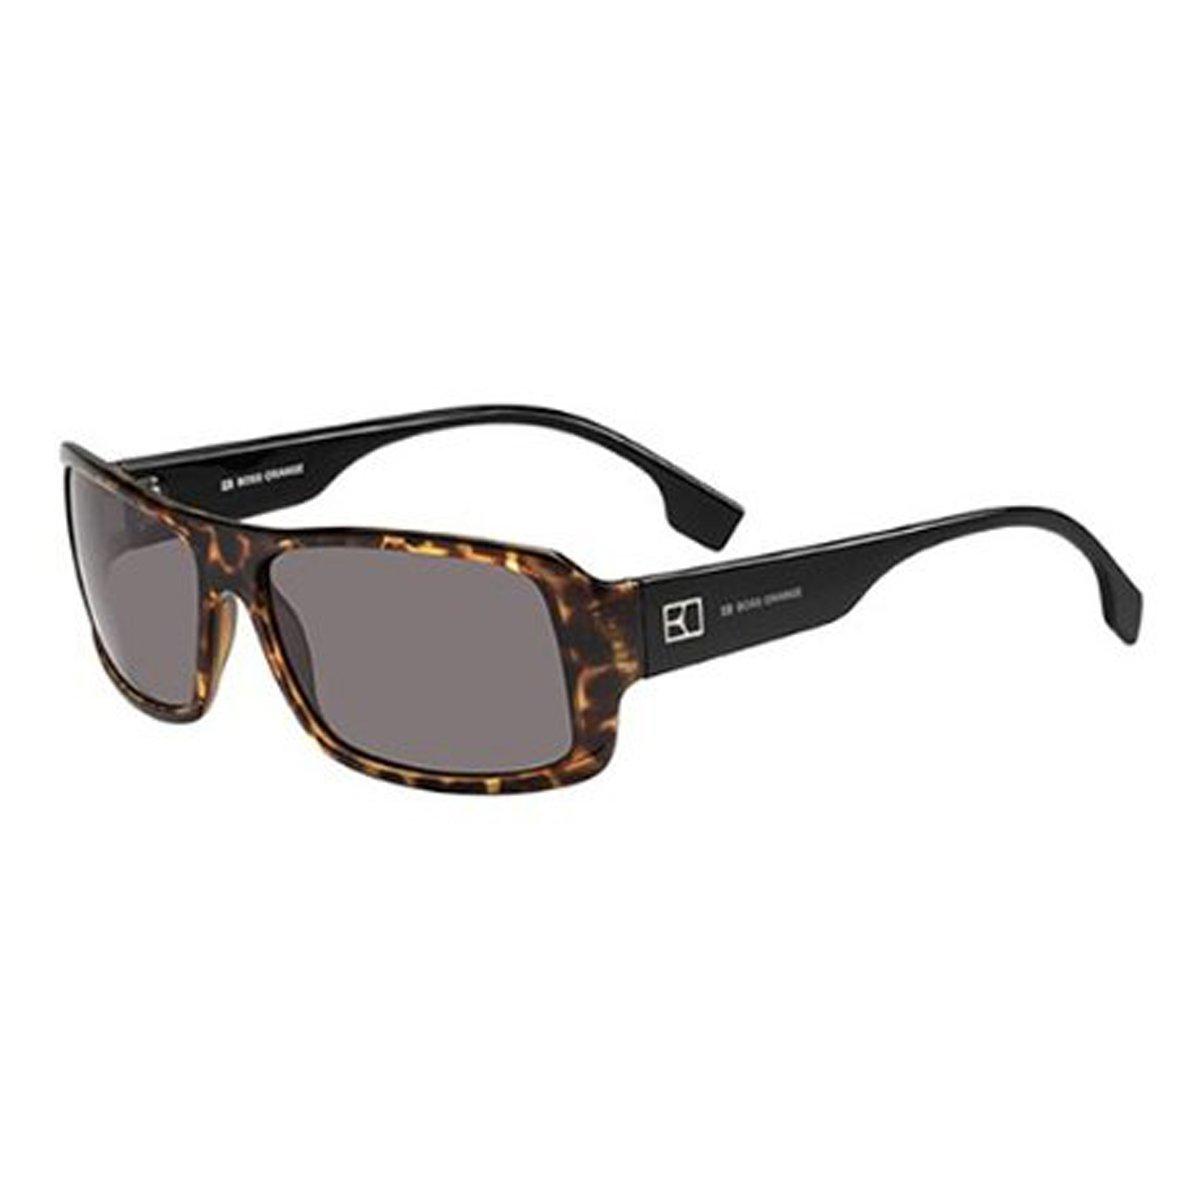 Amazon.com: Hugo Boss naranja 0032/S – Gafas de sol, la ...